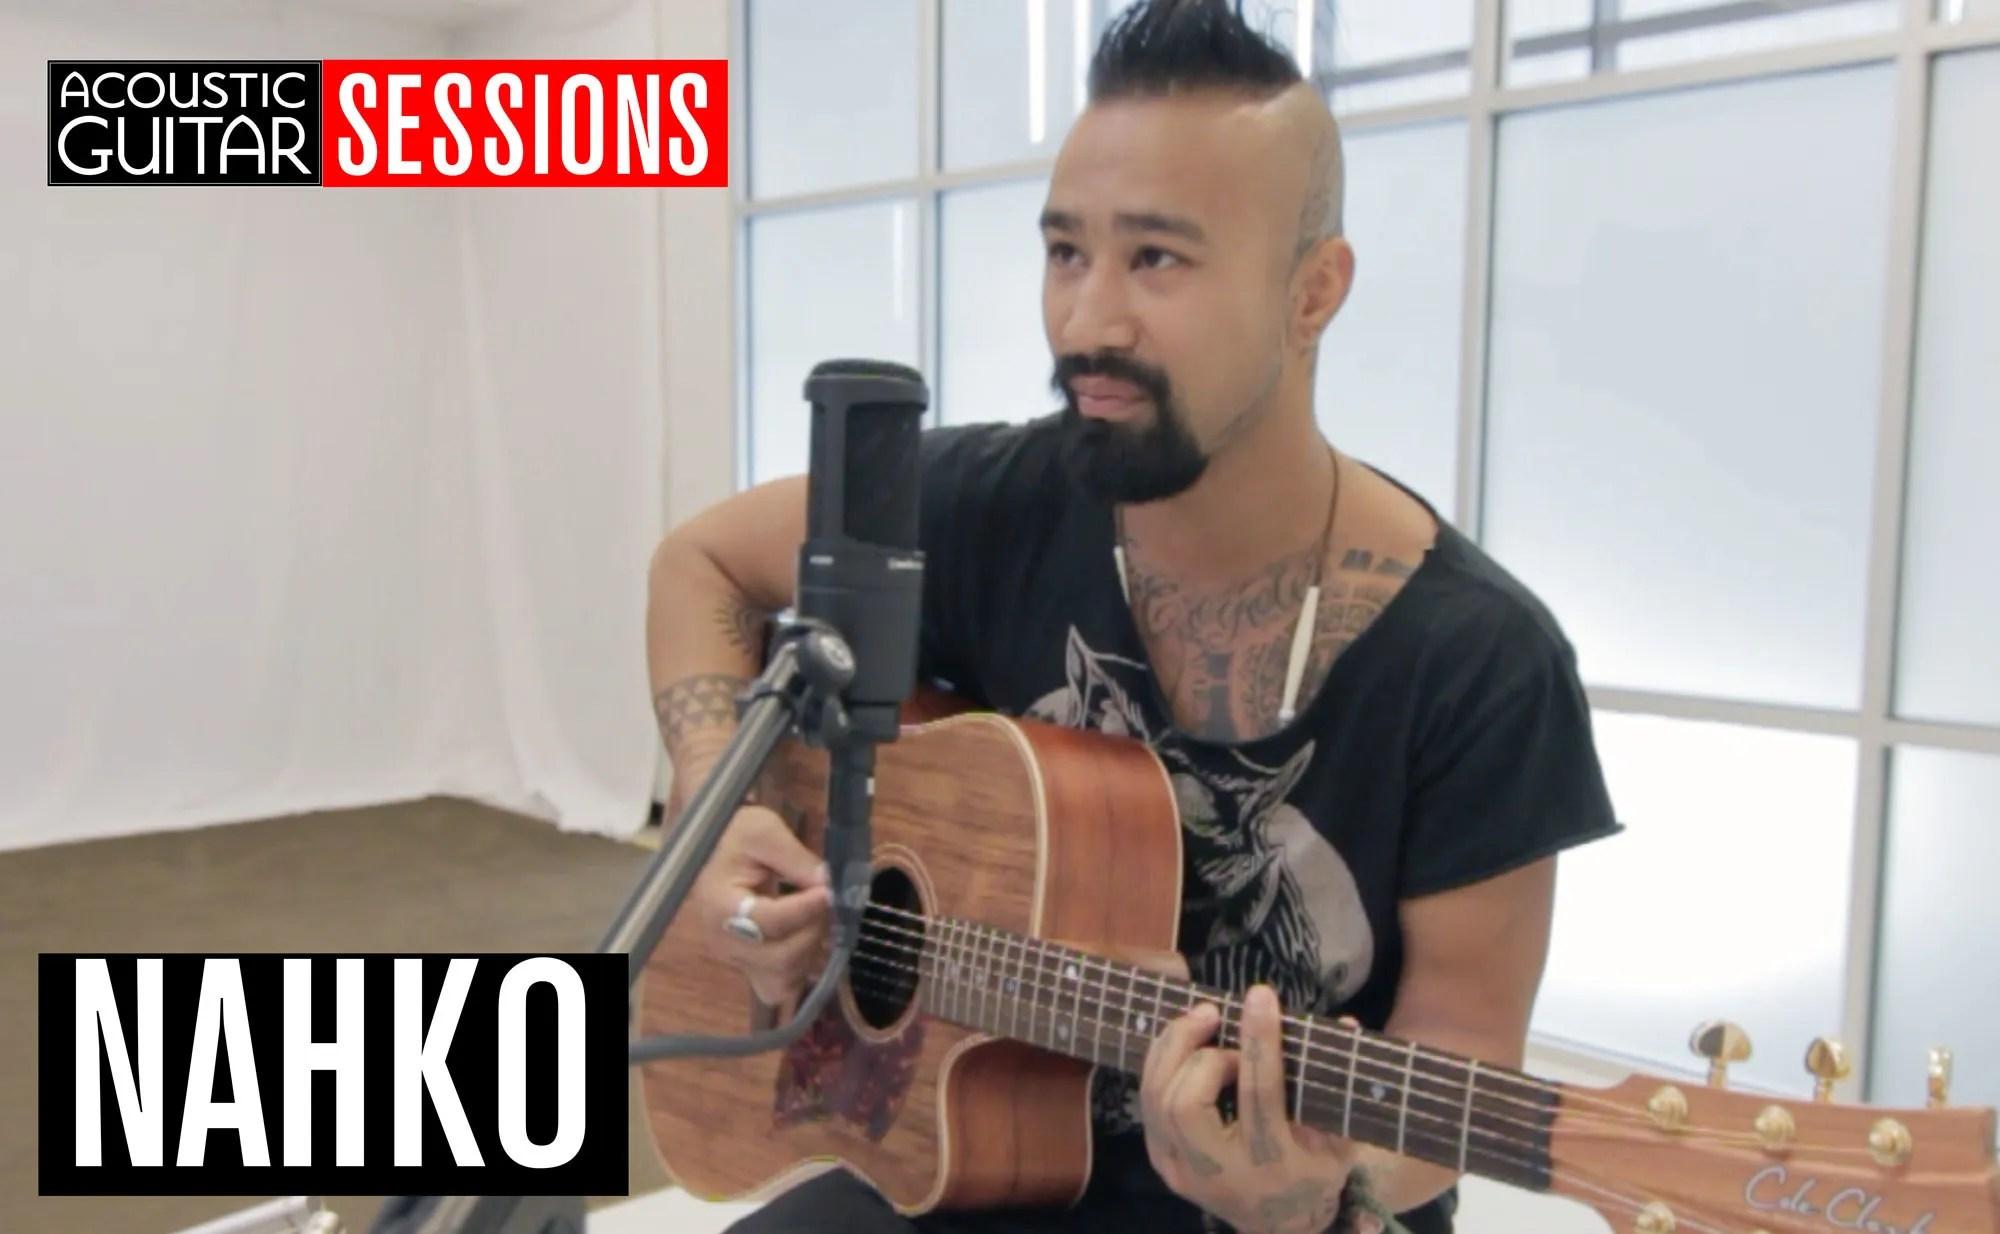 Acoustic Guitar Sessions Presents Nahko Acoustic Guitar